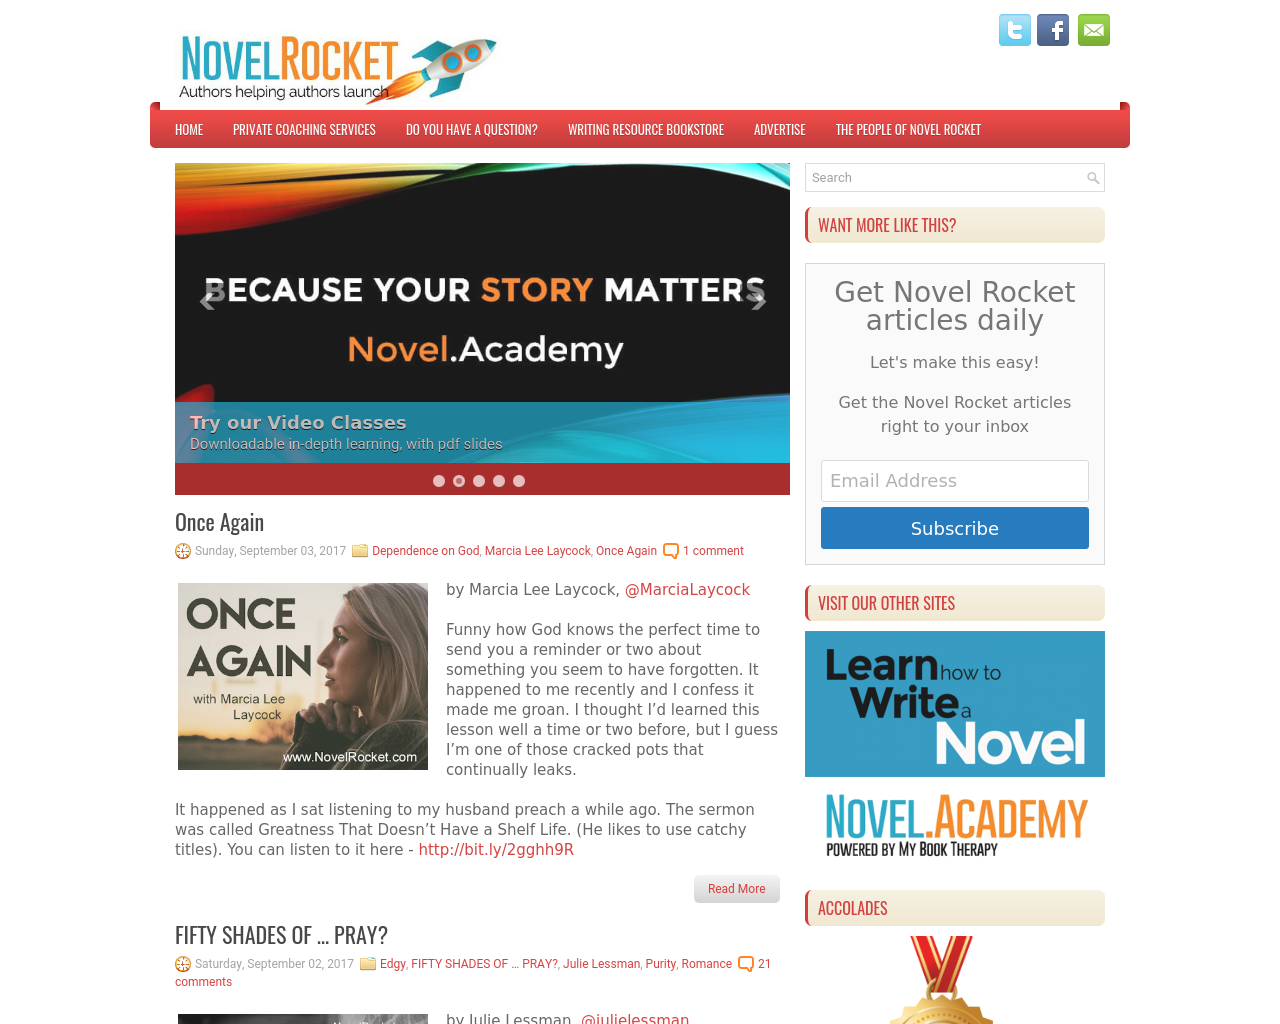 Novel-Rocket-Advertising-Reviews-Pricing